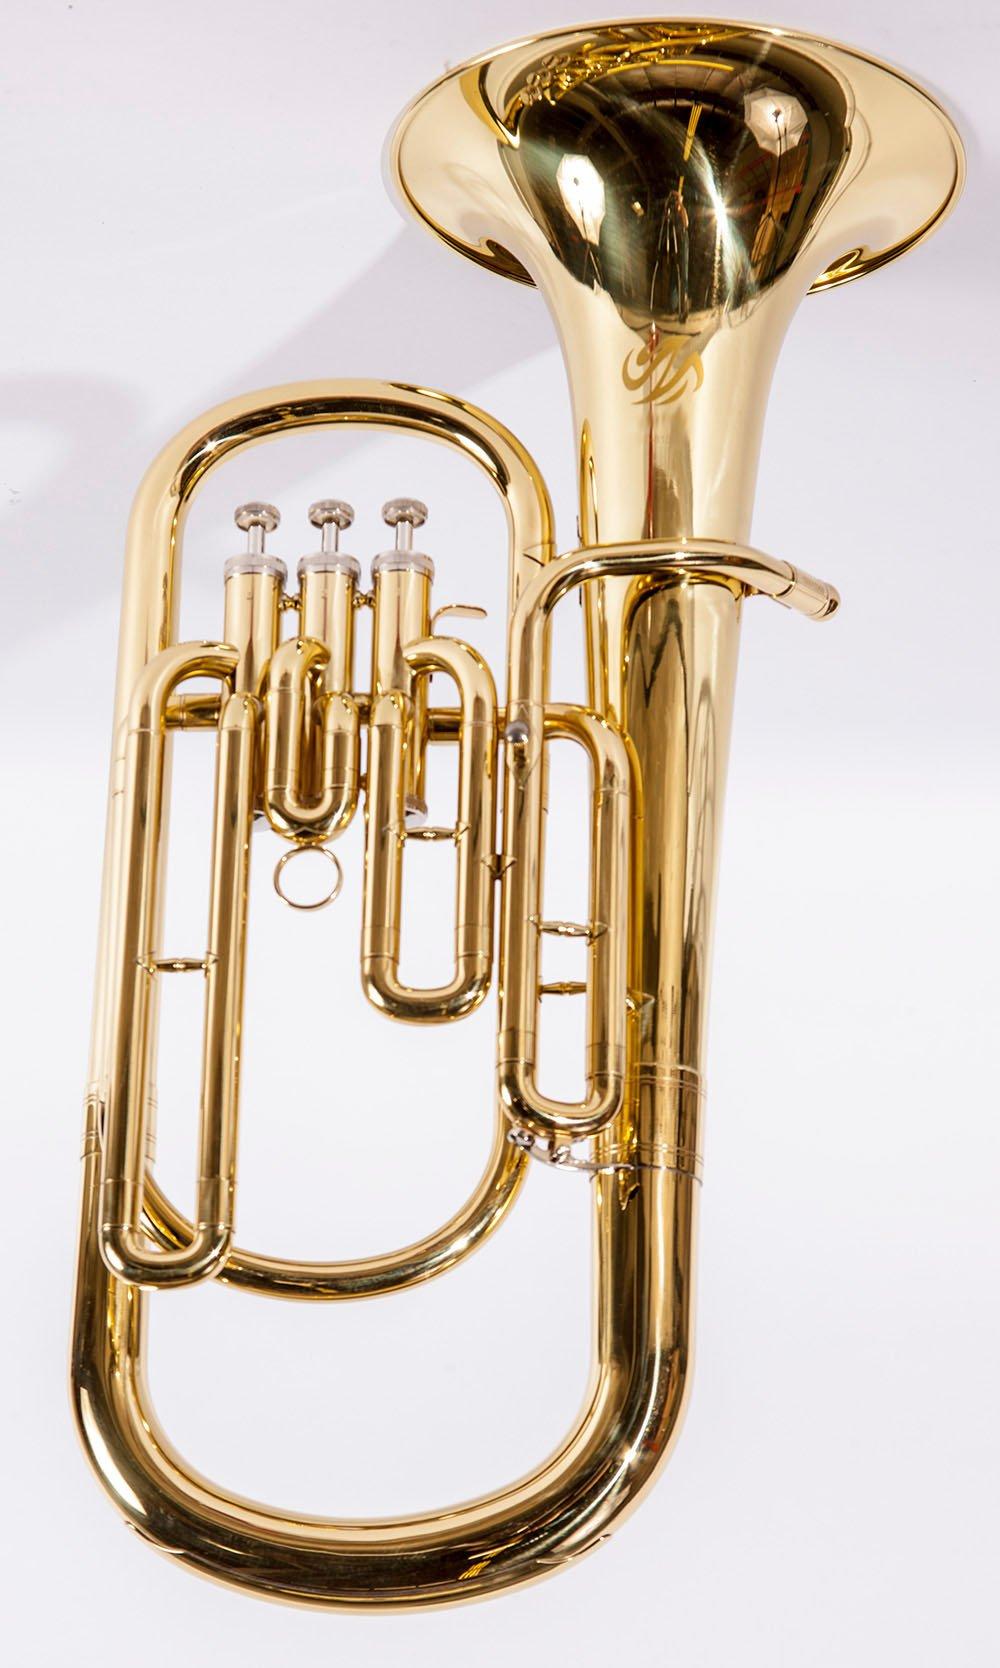 Valkyrie 801L3 Standard Level Baritone Horn, Gold